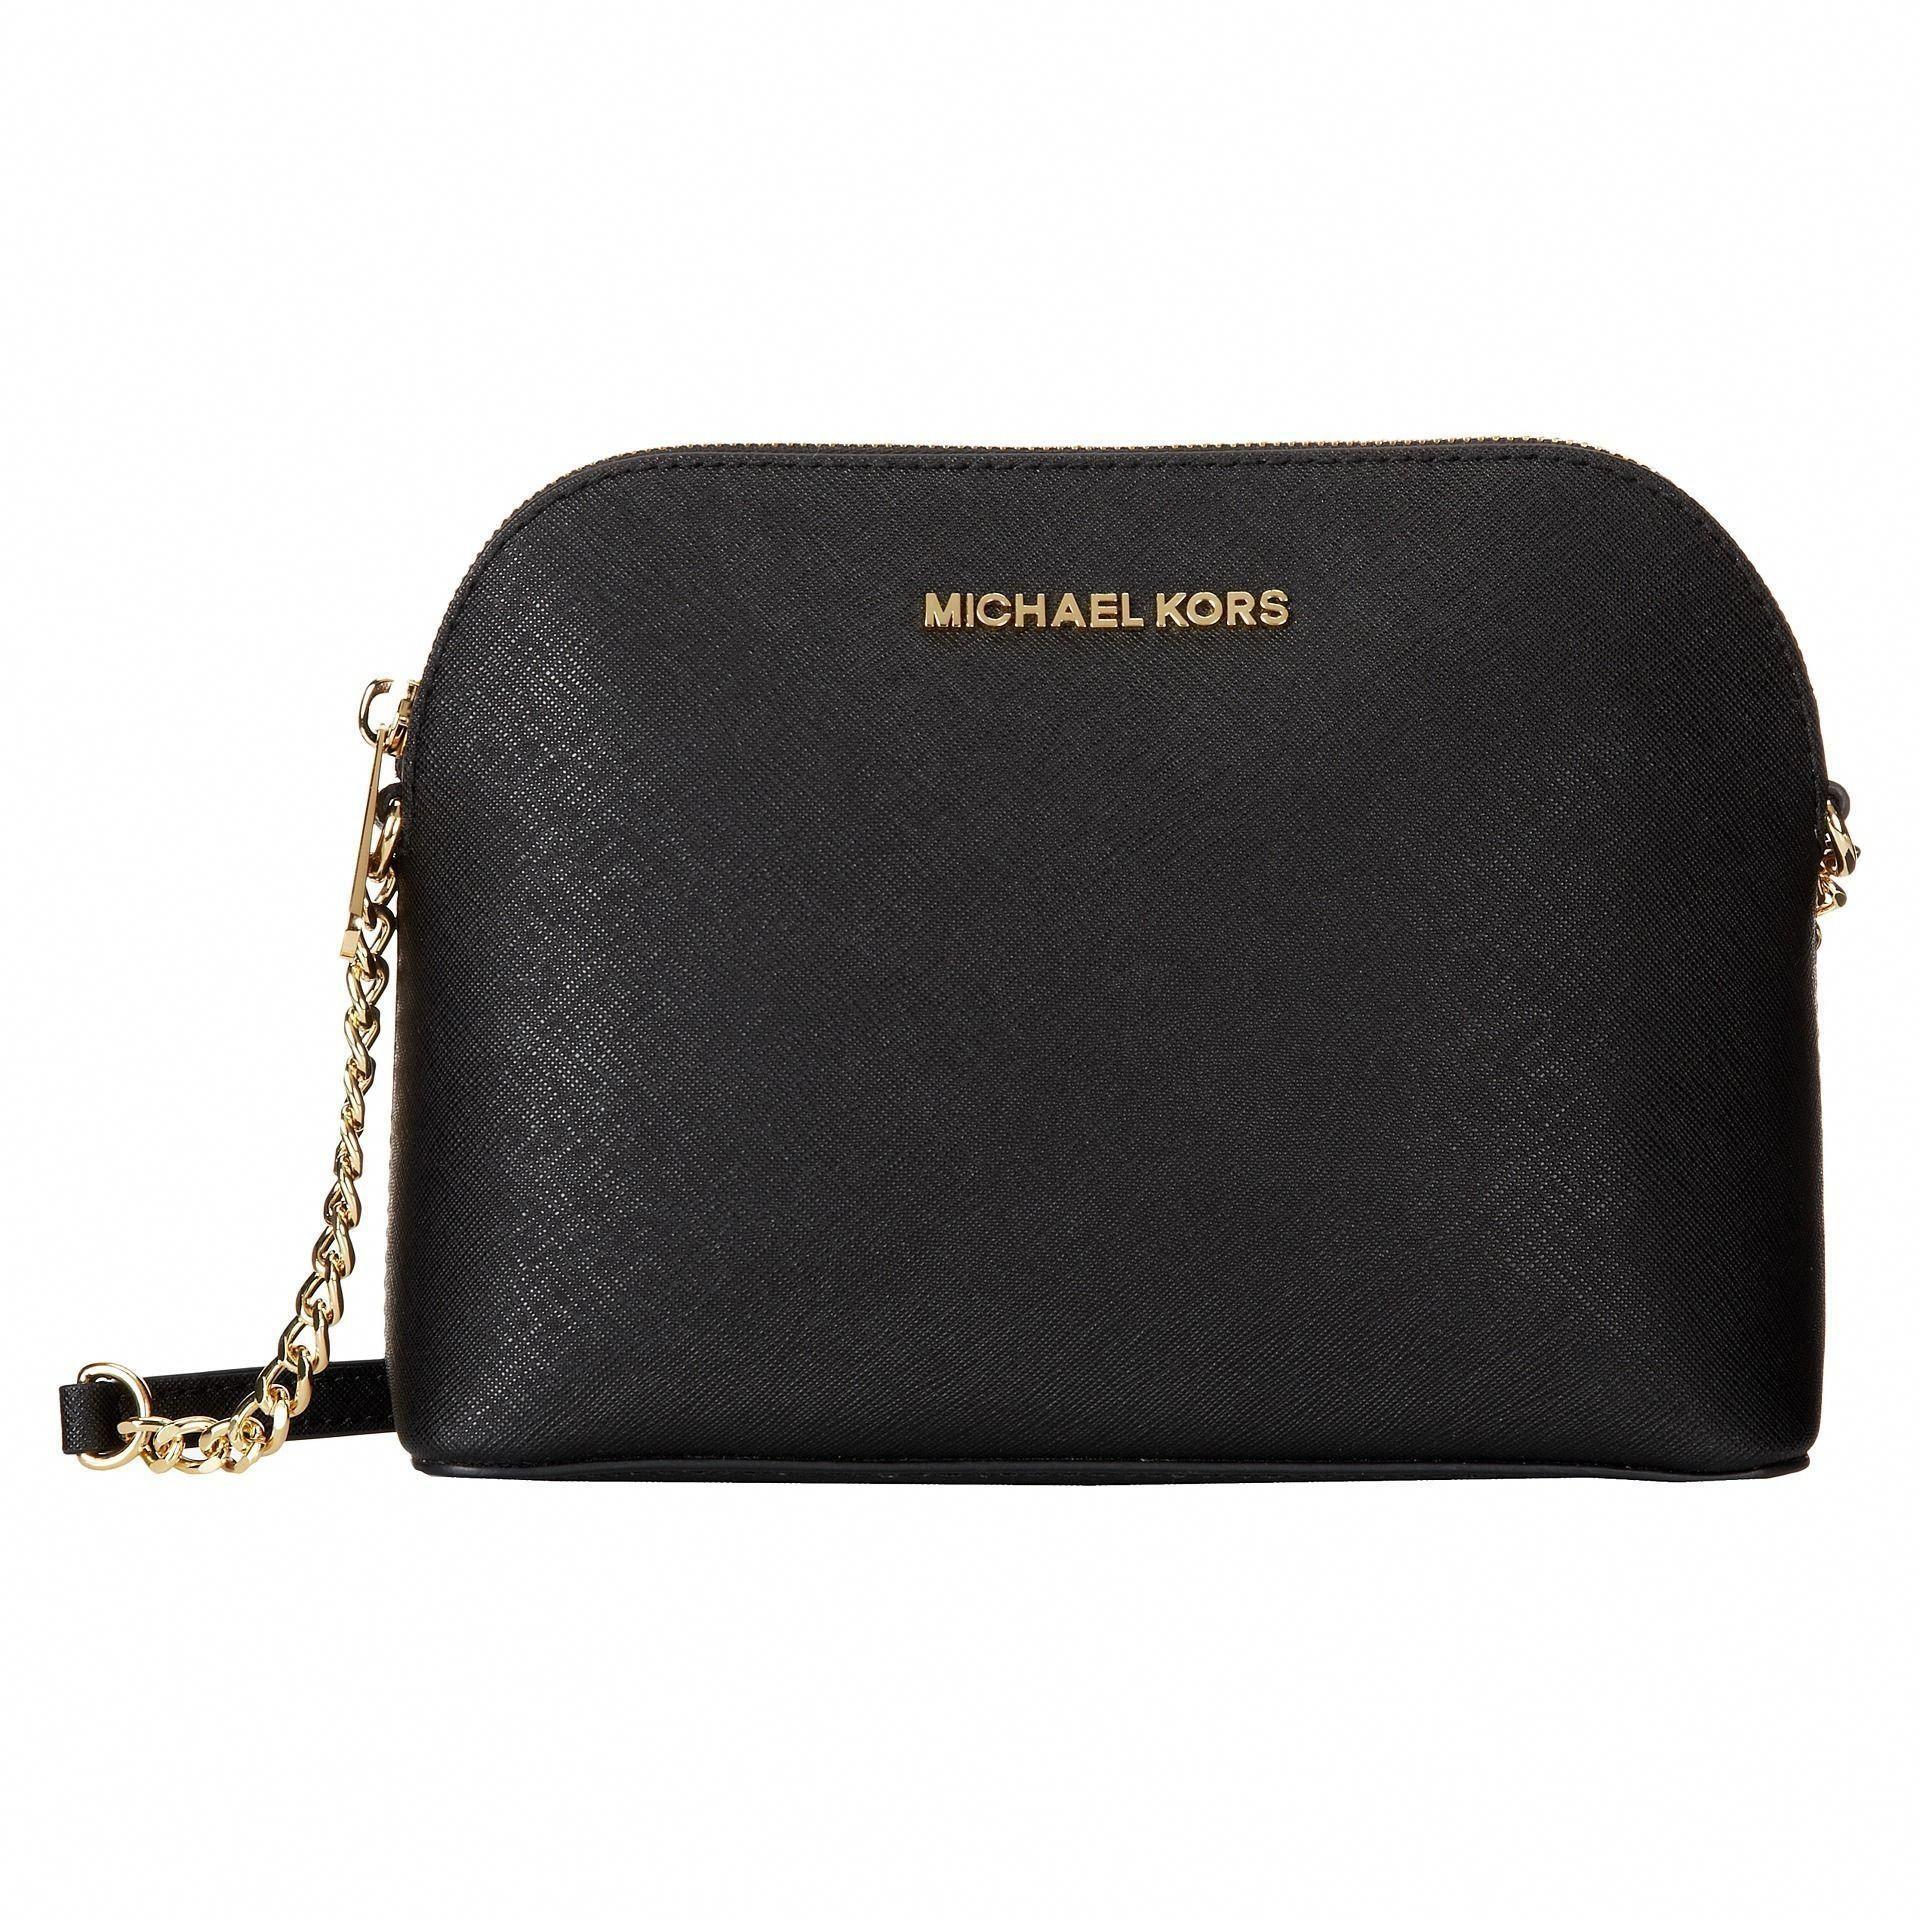 8a3dd9796ddc Michael Michael Kors Cindy Black/ Gold Saffiano Leather Dome Handbag  (Black/Gold)